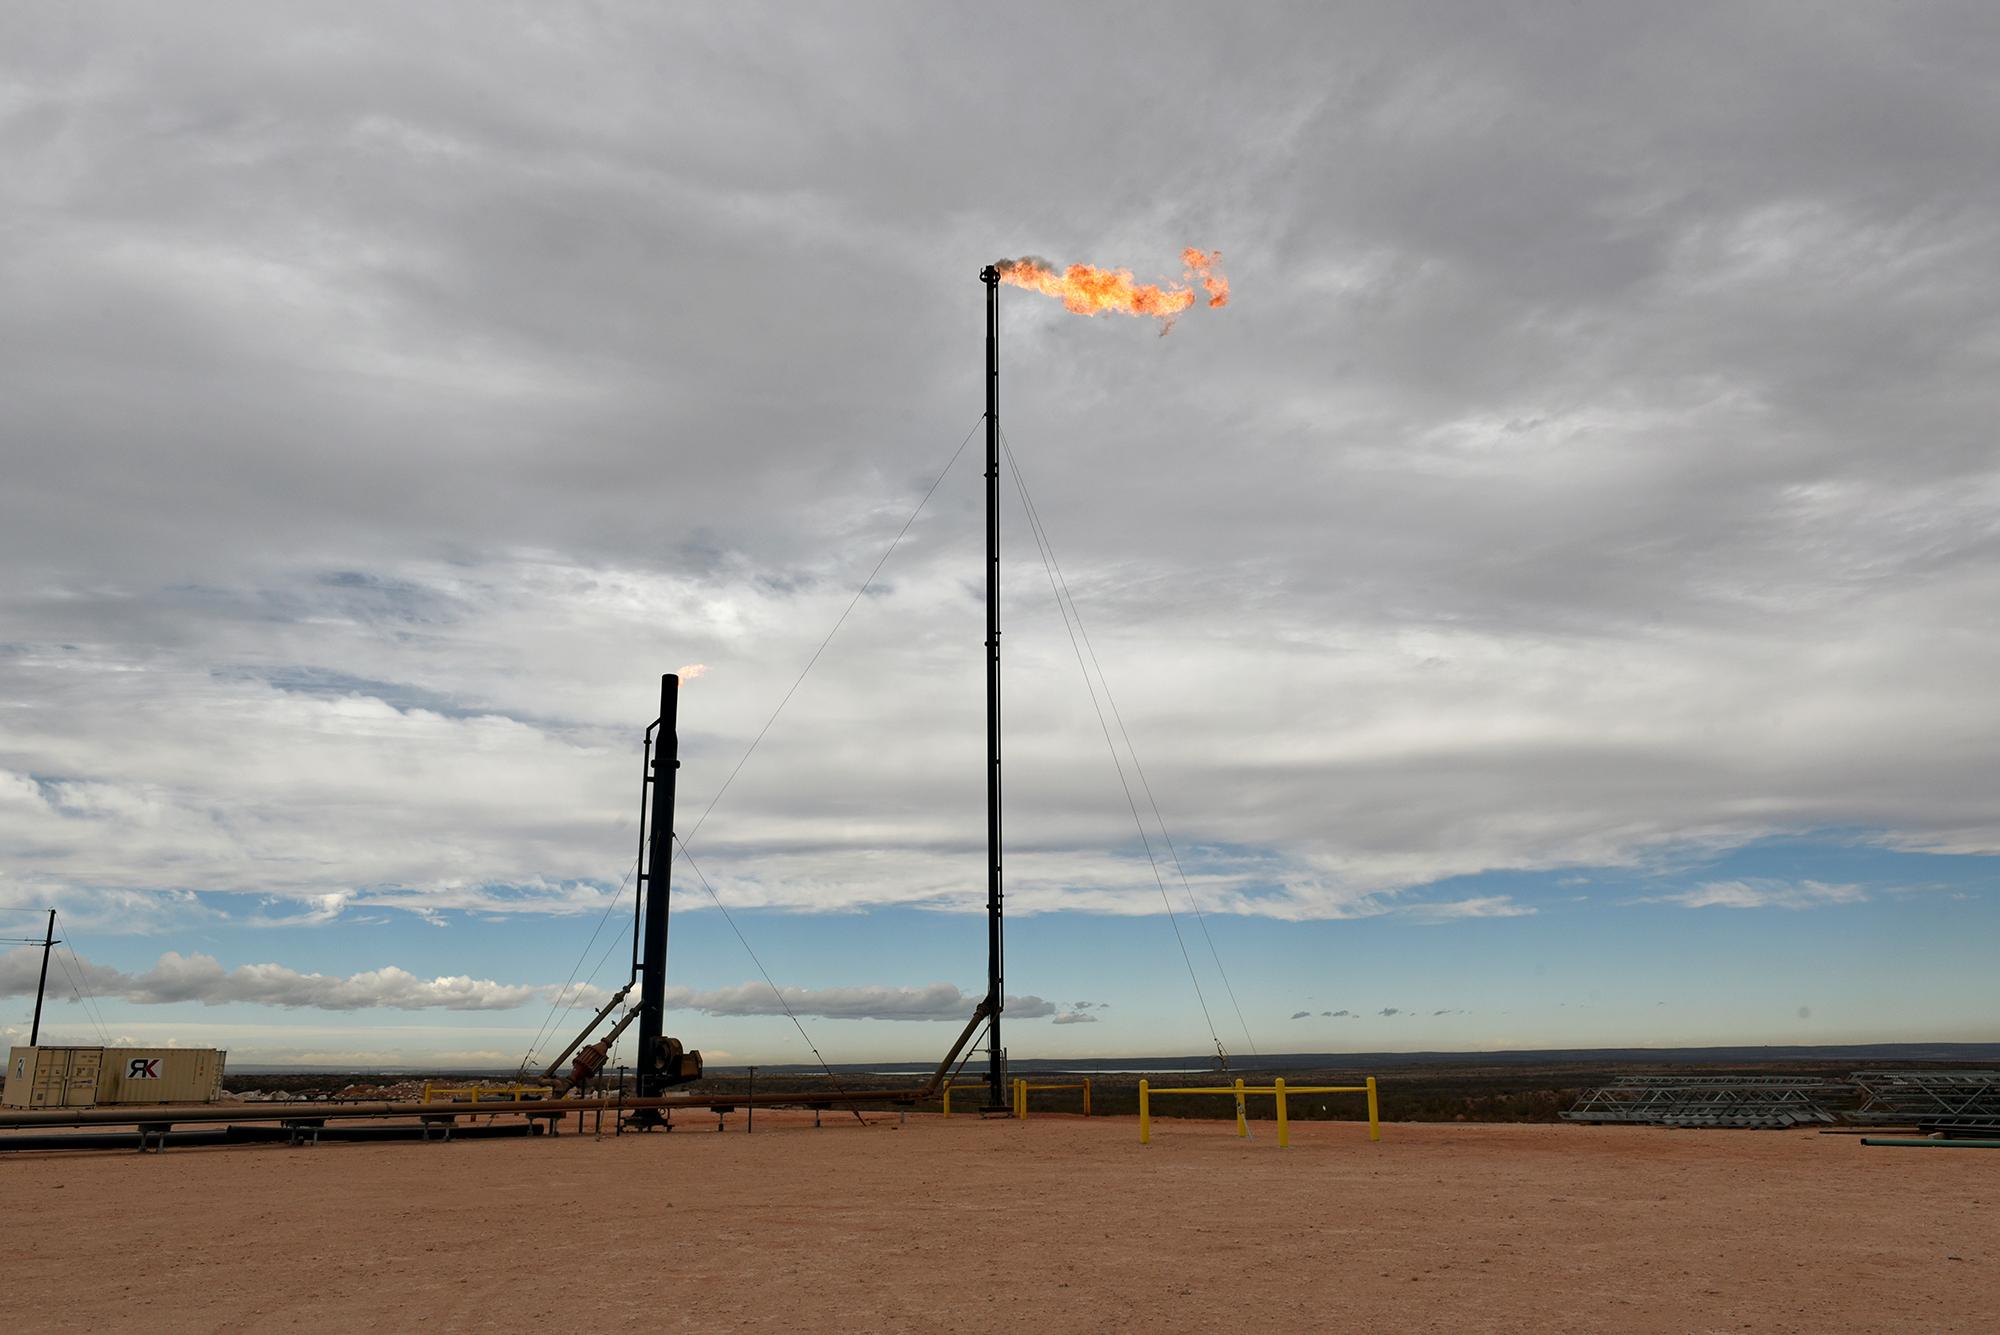 Exxon faces $20 billion hit from 'epic failure' of a decade ago